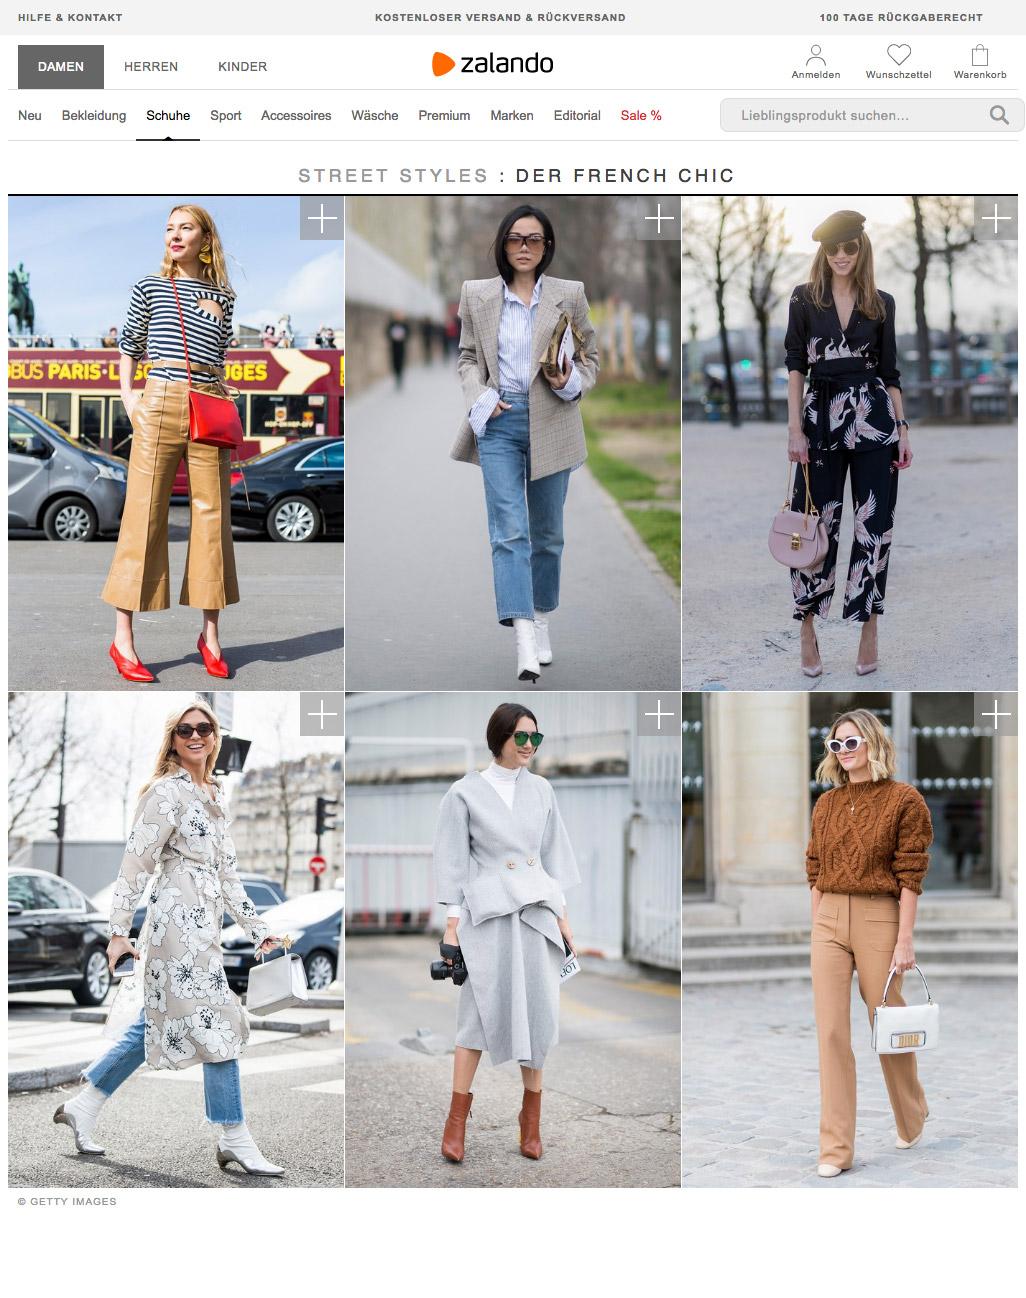 Zalando Streetstyles - 2017-03 - Alexandra Lapp - found on https://www.zalando.de/damen-streetstyle/damen/